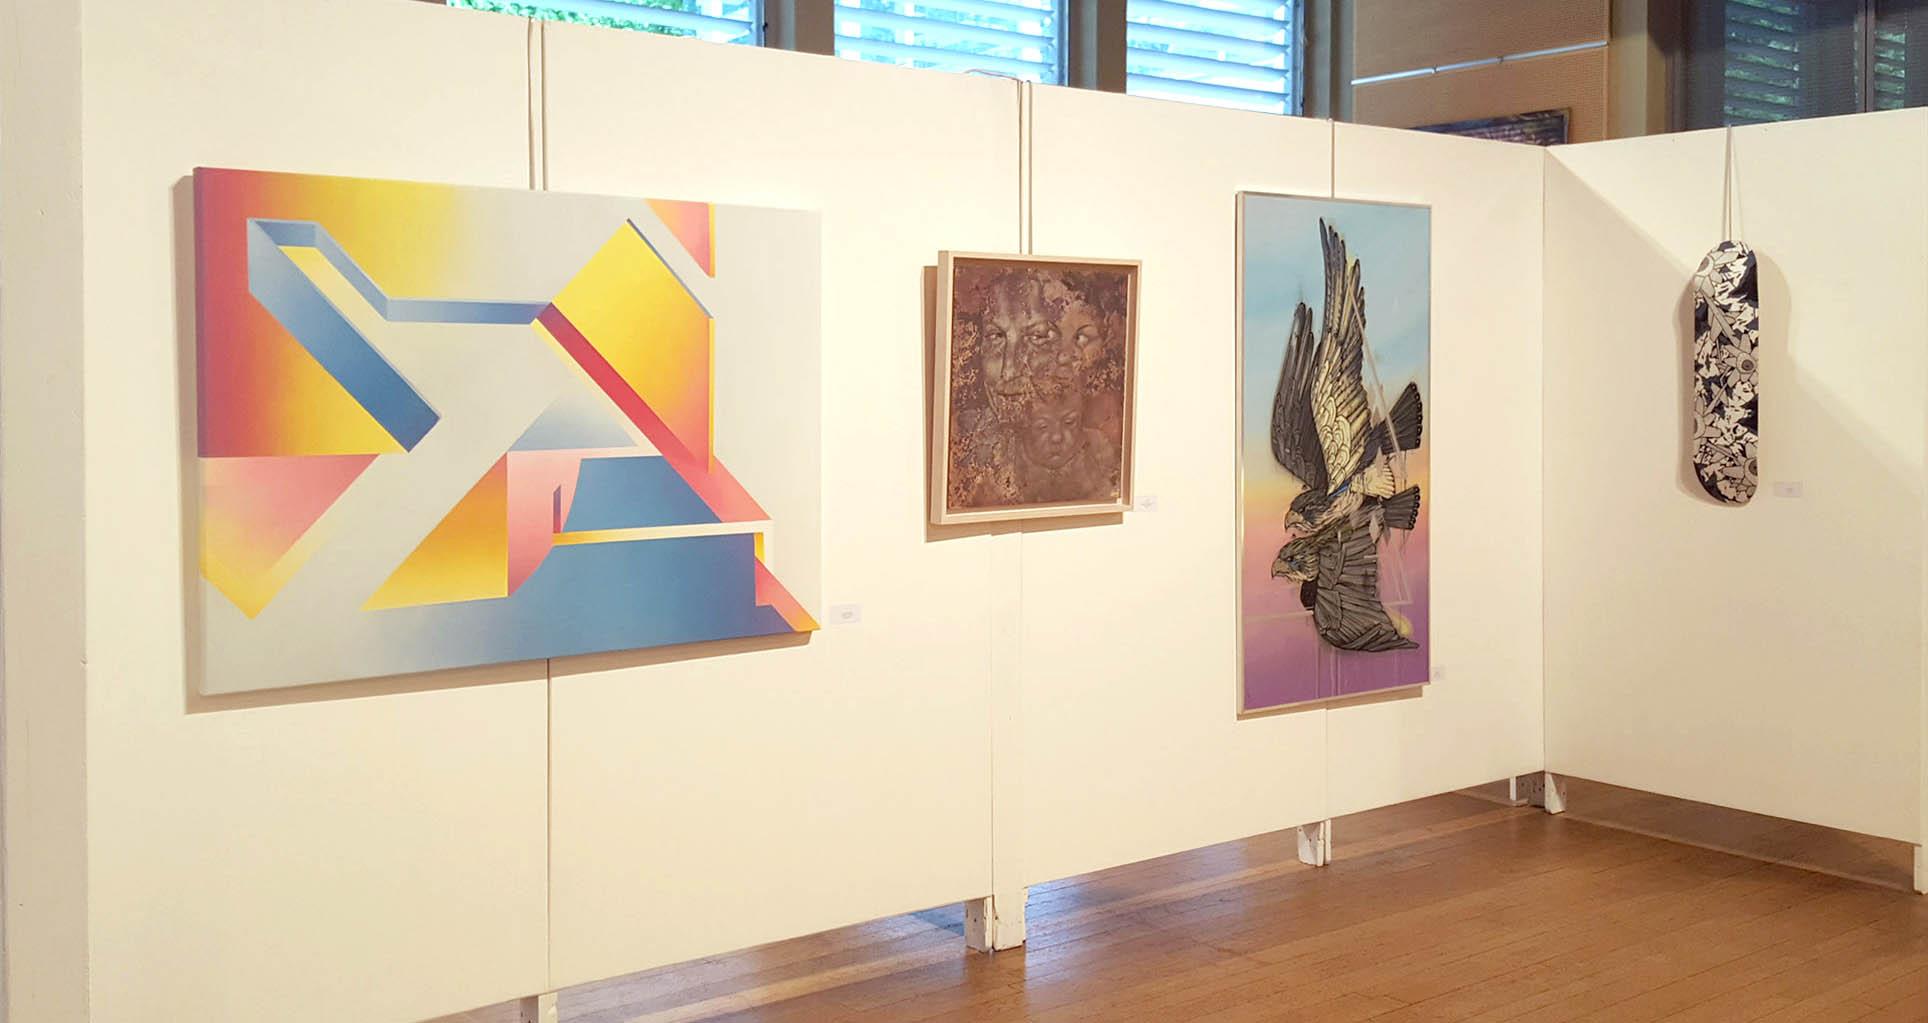 https://www.propaganza.be/wp-content/uploads/2015/09/propaganza-urban-artist-graffiti-graff-street-art-spray-painting-belgique-vapors-expo-exhibition-uccle-ccu-2017.jpg